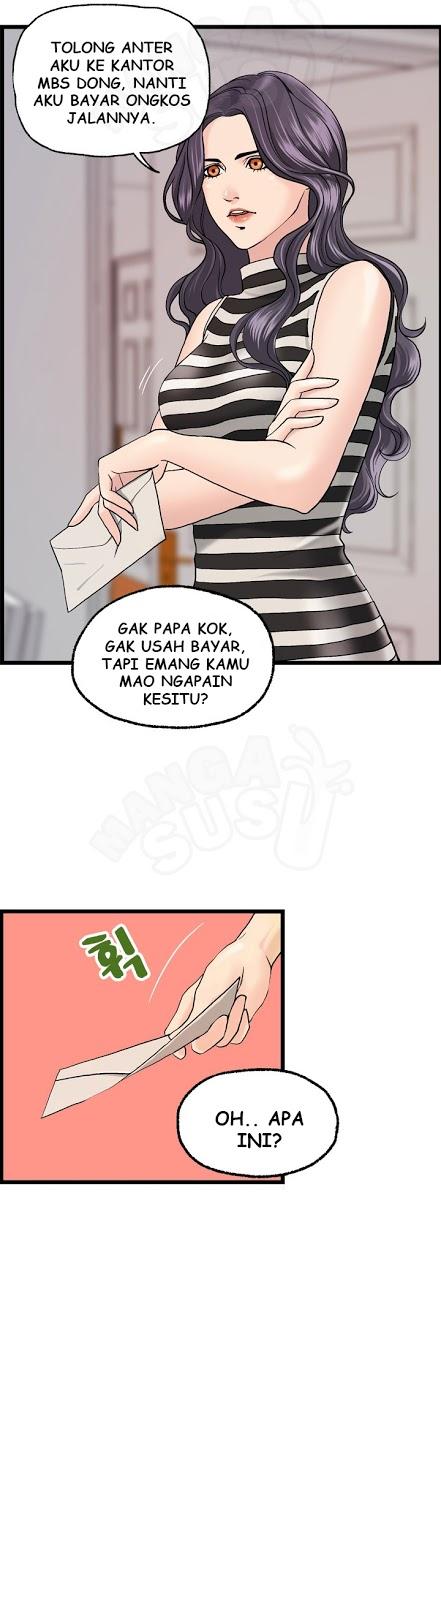 Komik Hentai Abg Anak Ibu Kost dan Para Gadis Cantik Part 9